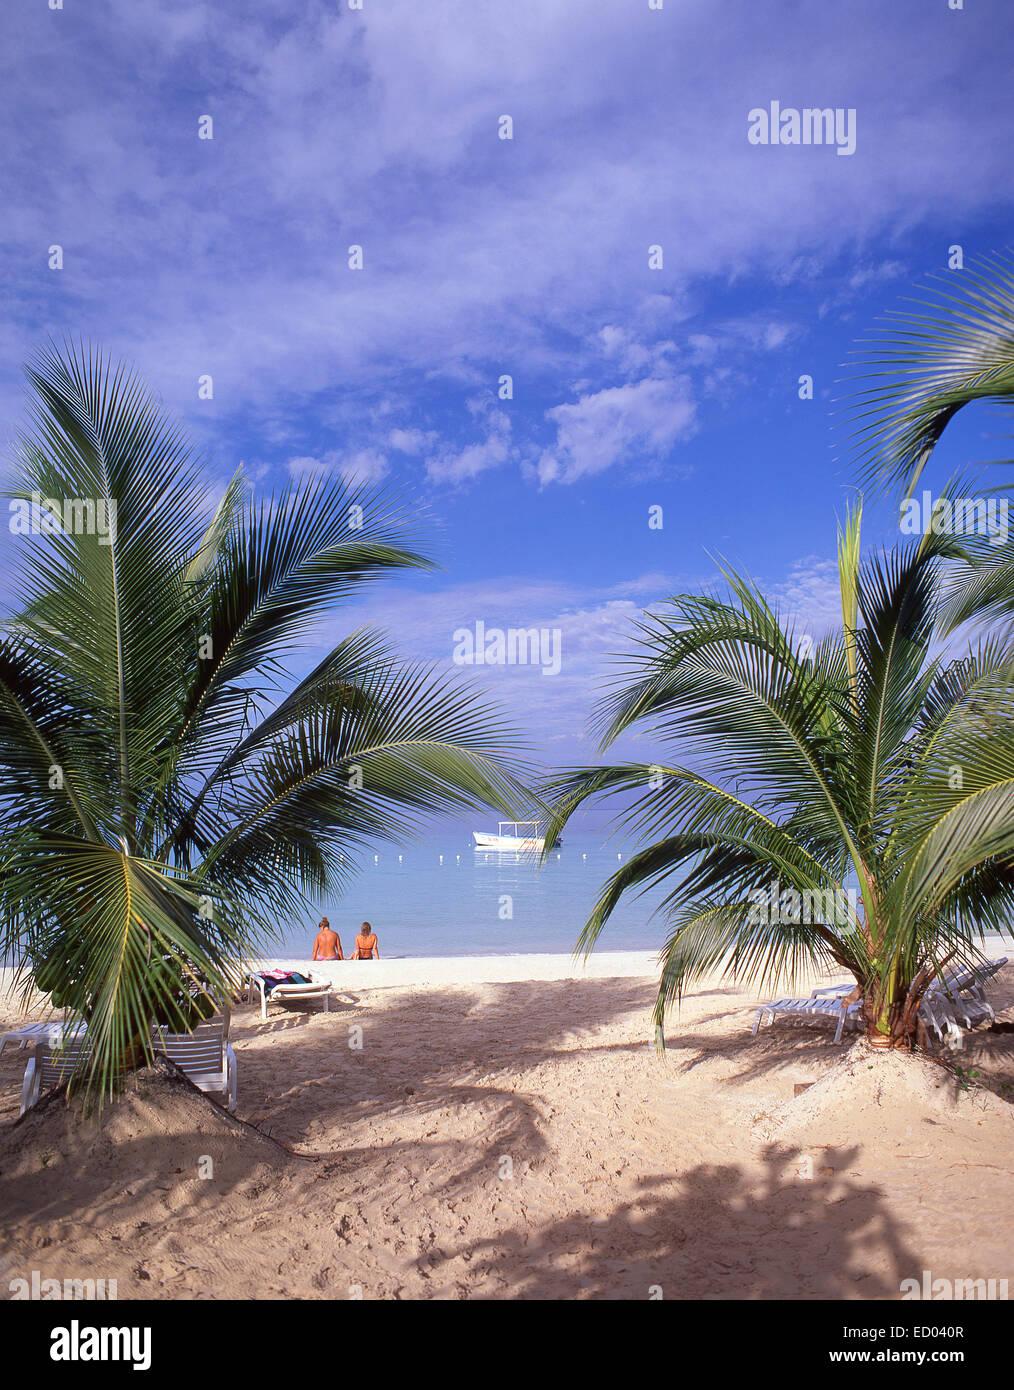 Negril Beach, Negril, Westmoreland Parish, Jamaica, Greater Antilles, Caribbean - Stock Image